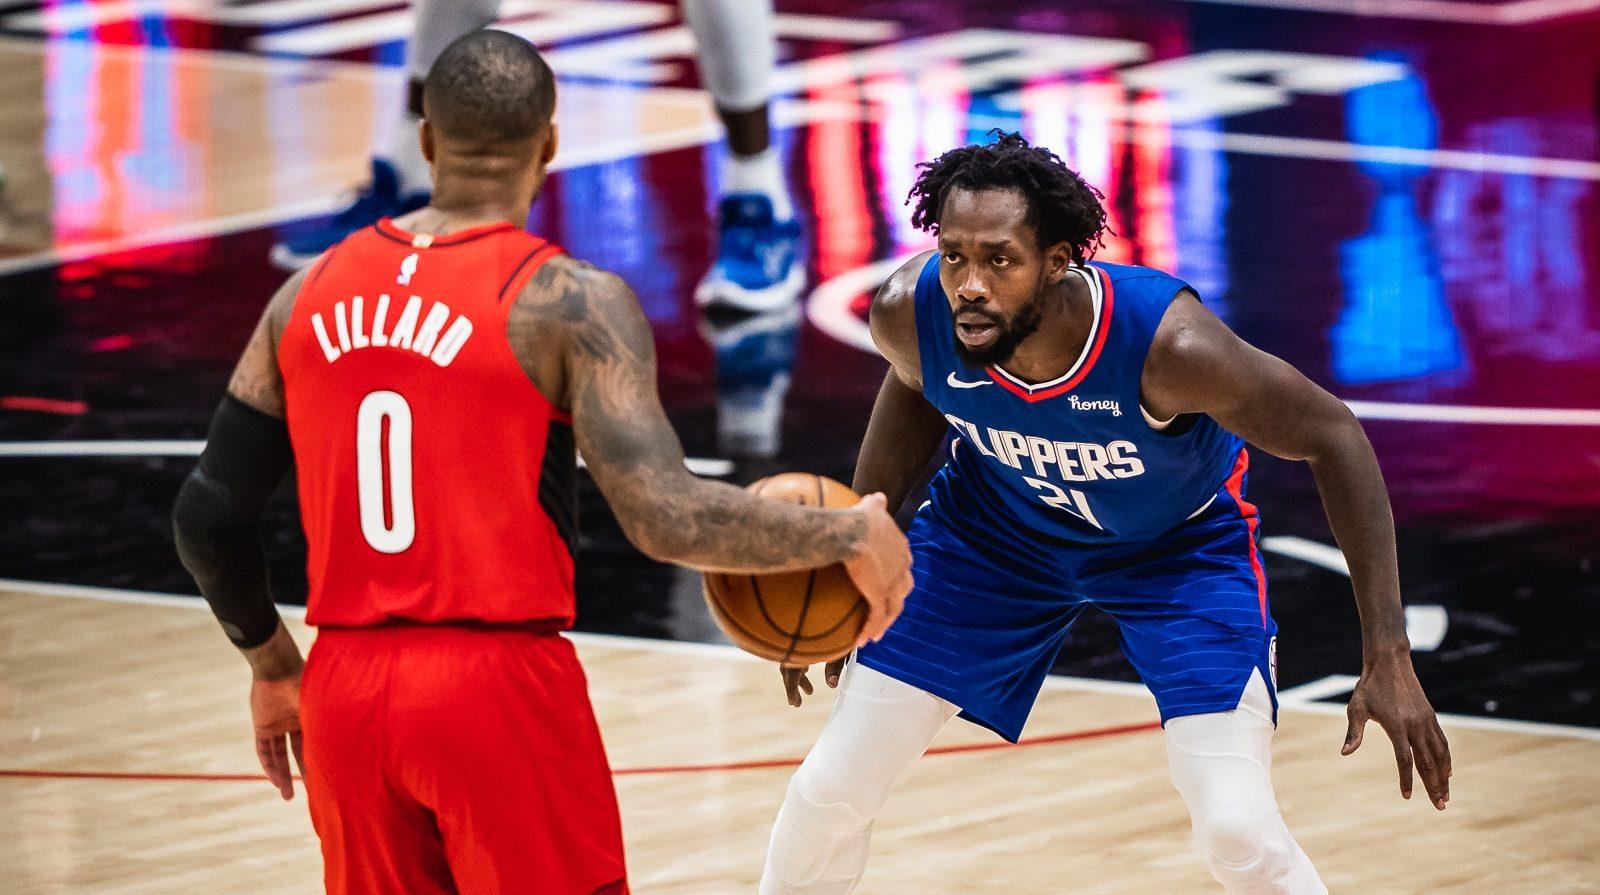 Clippers vs Blazers Player Grades